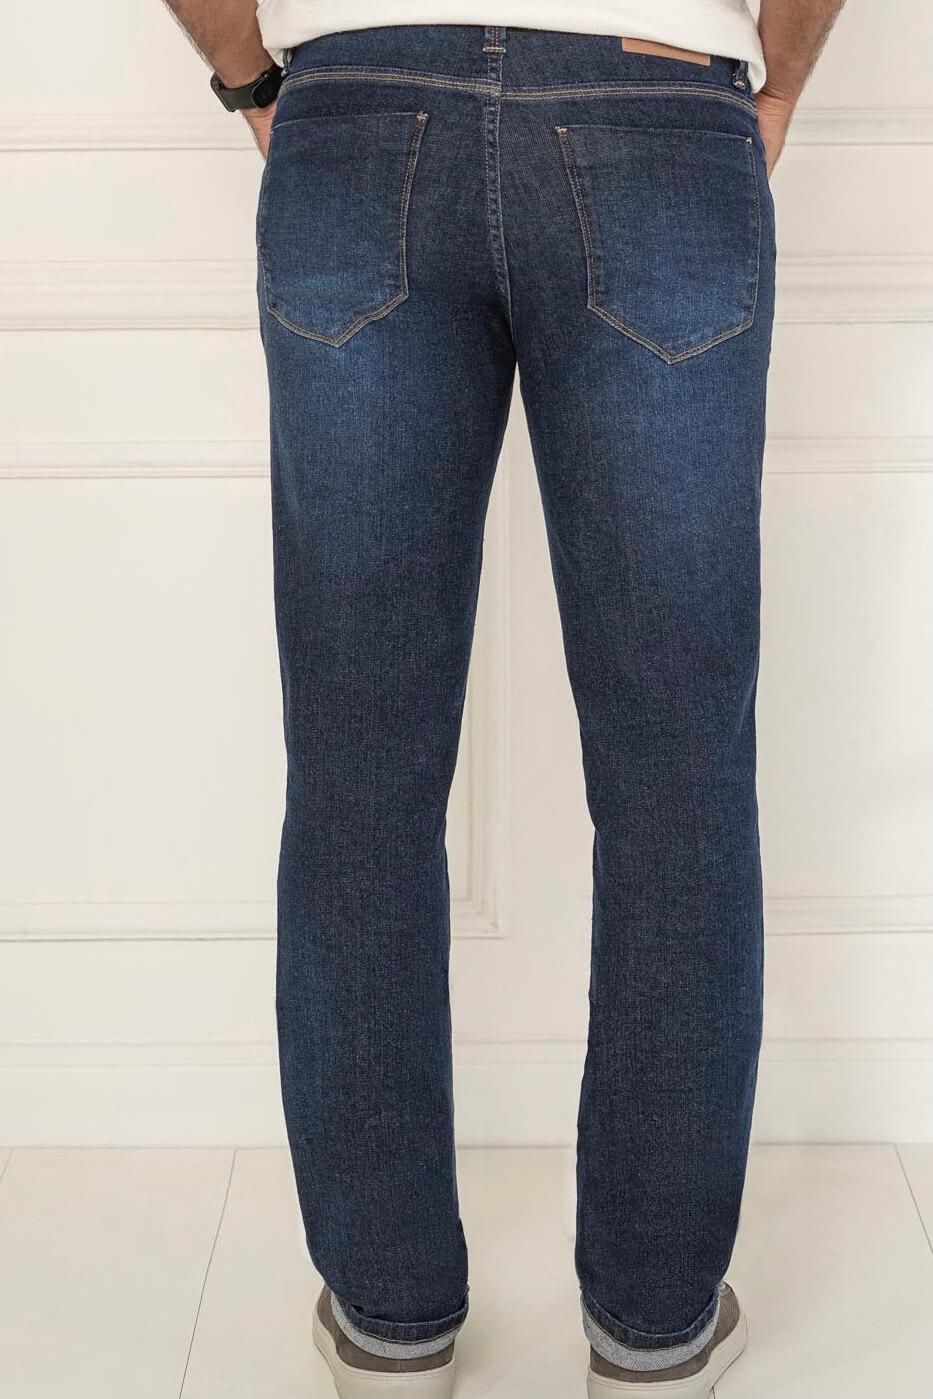 Calça Tradicional Jeans Lycra Masculino K20154 - KACOLACO